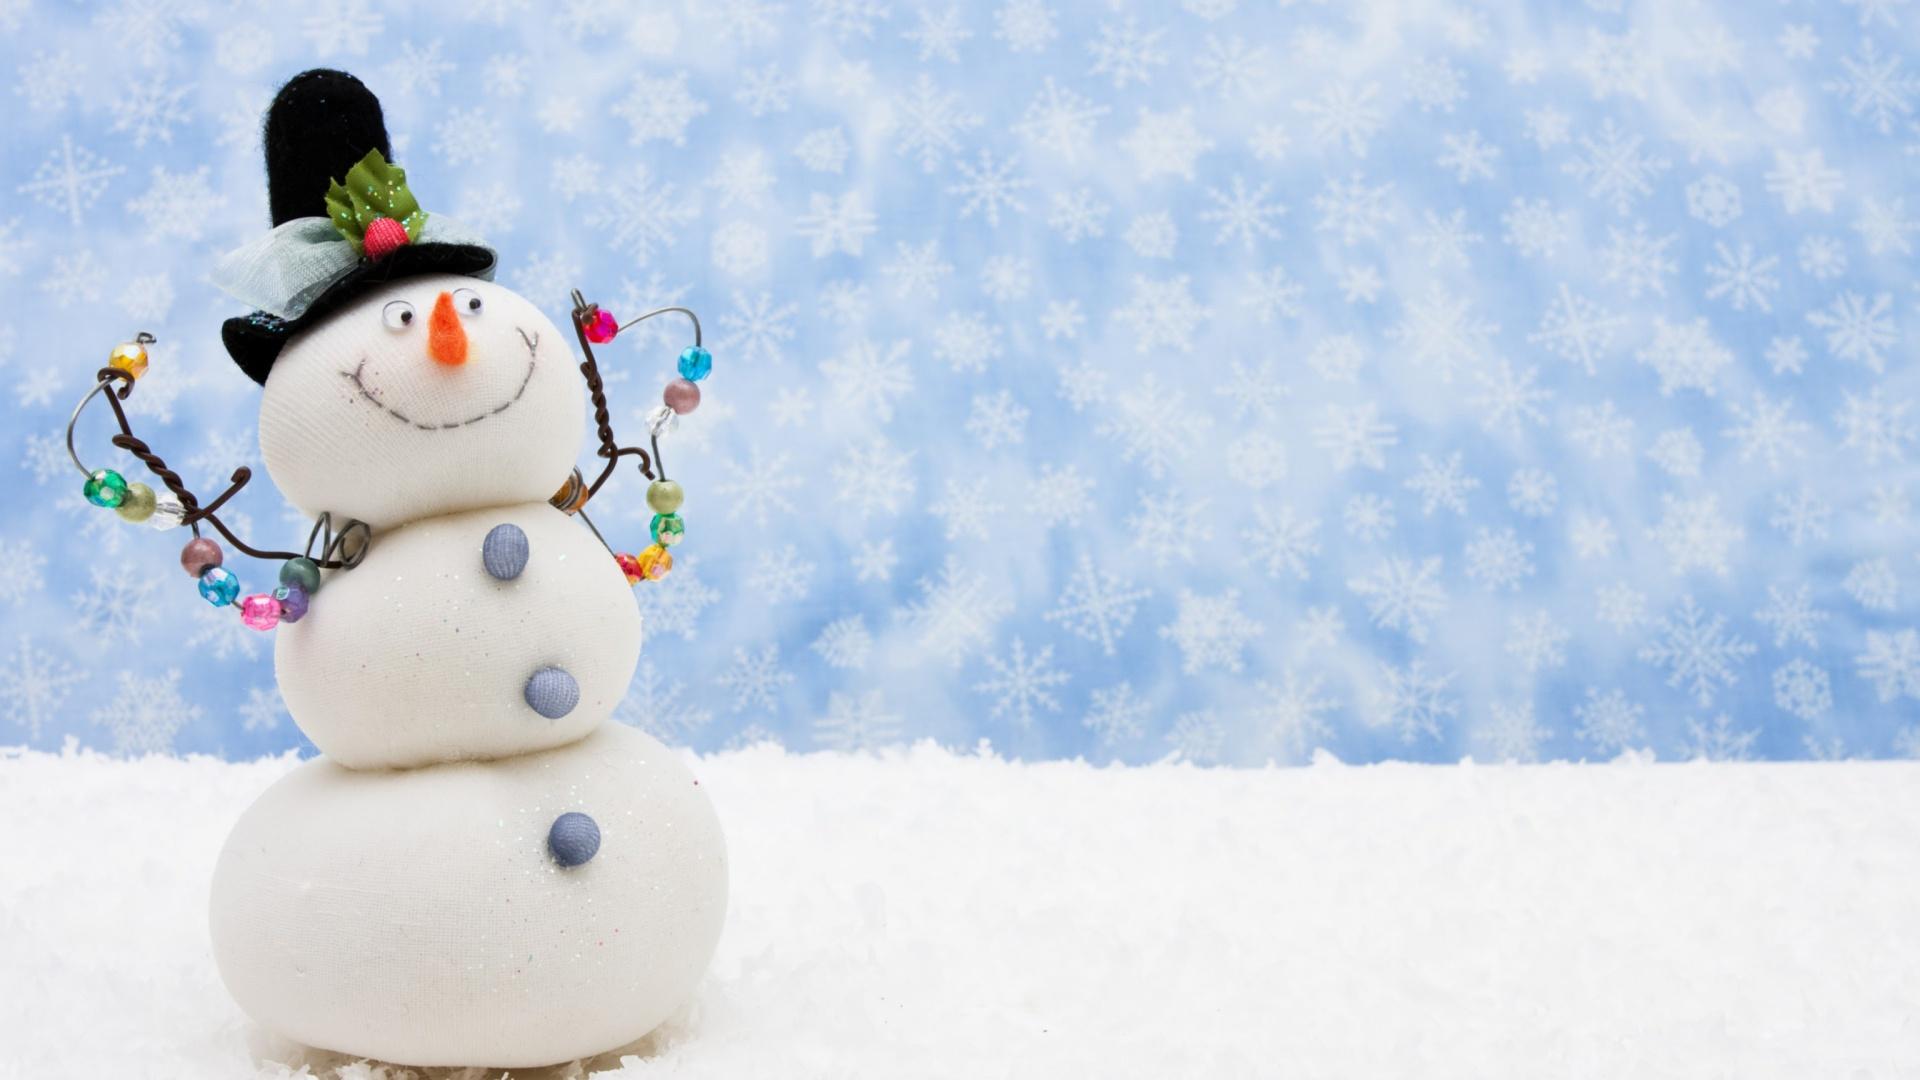 SnowMan Wallpaper 1440x900